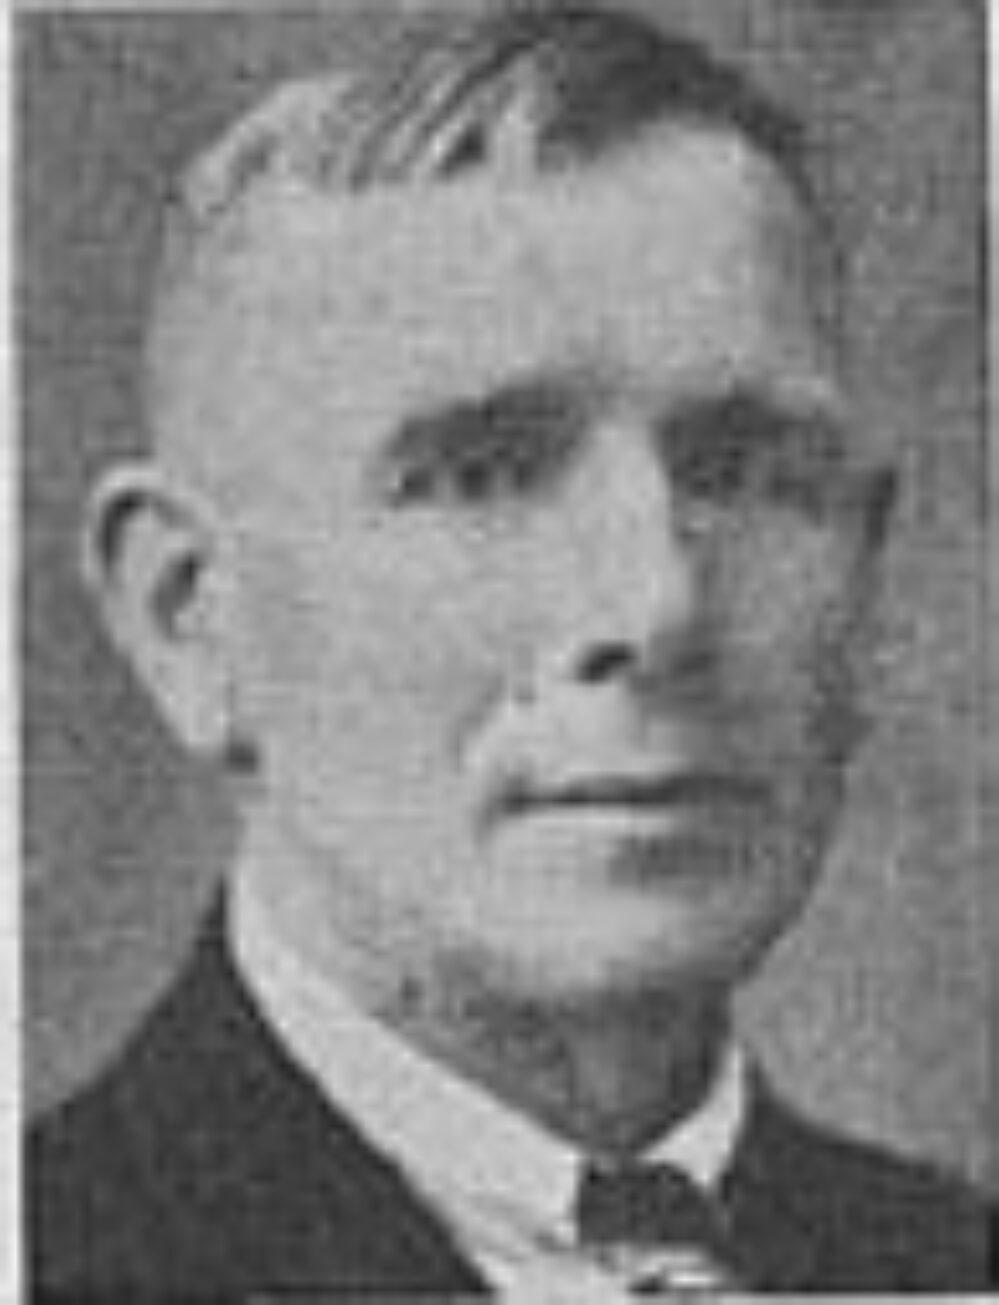 Stian Mathias Rasmussen Østebrød